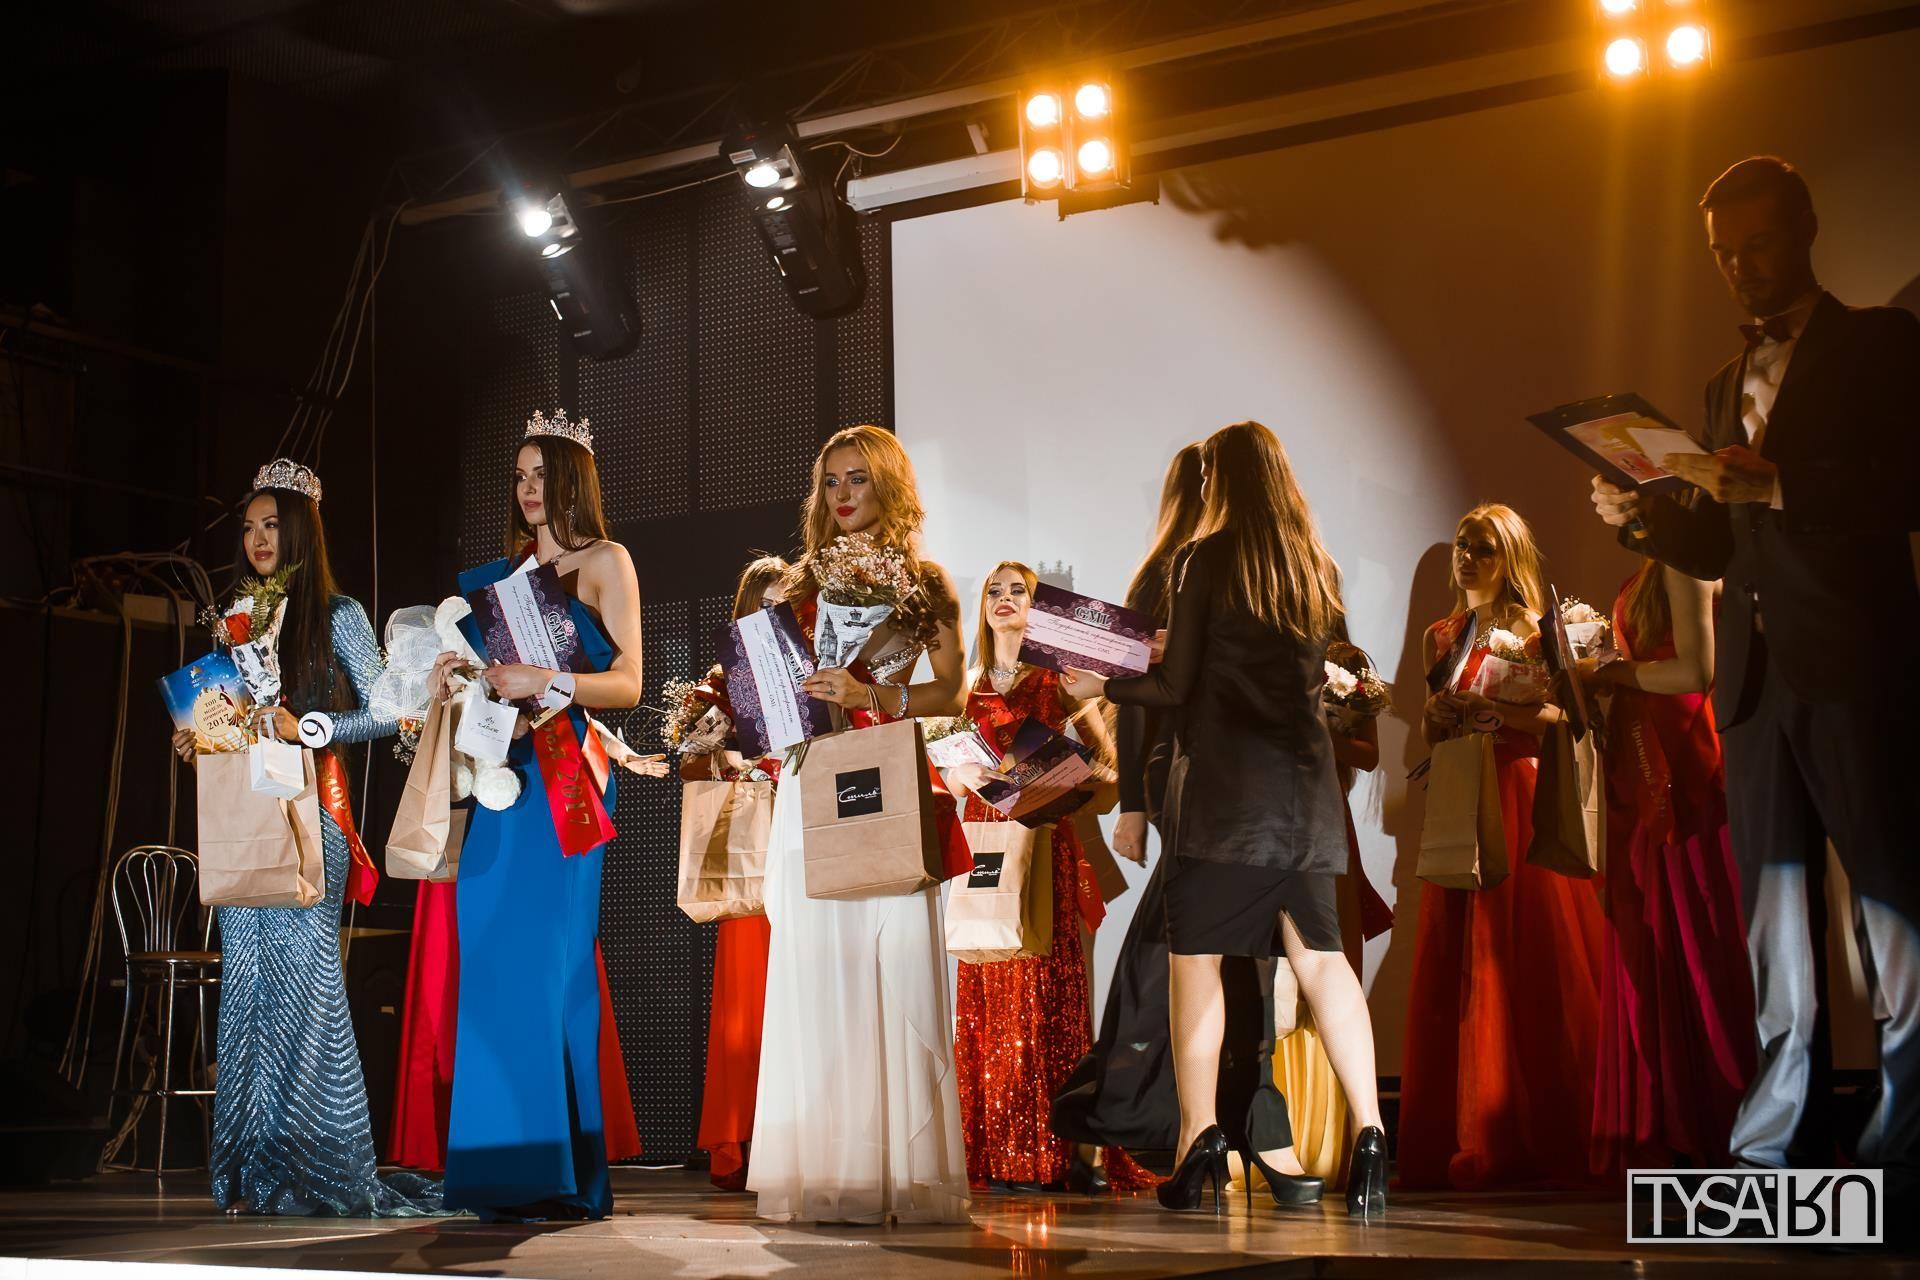 Красавица Приморья 2017 - наша студентка!